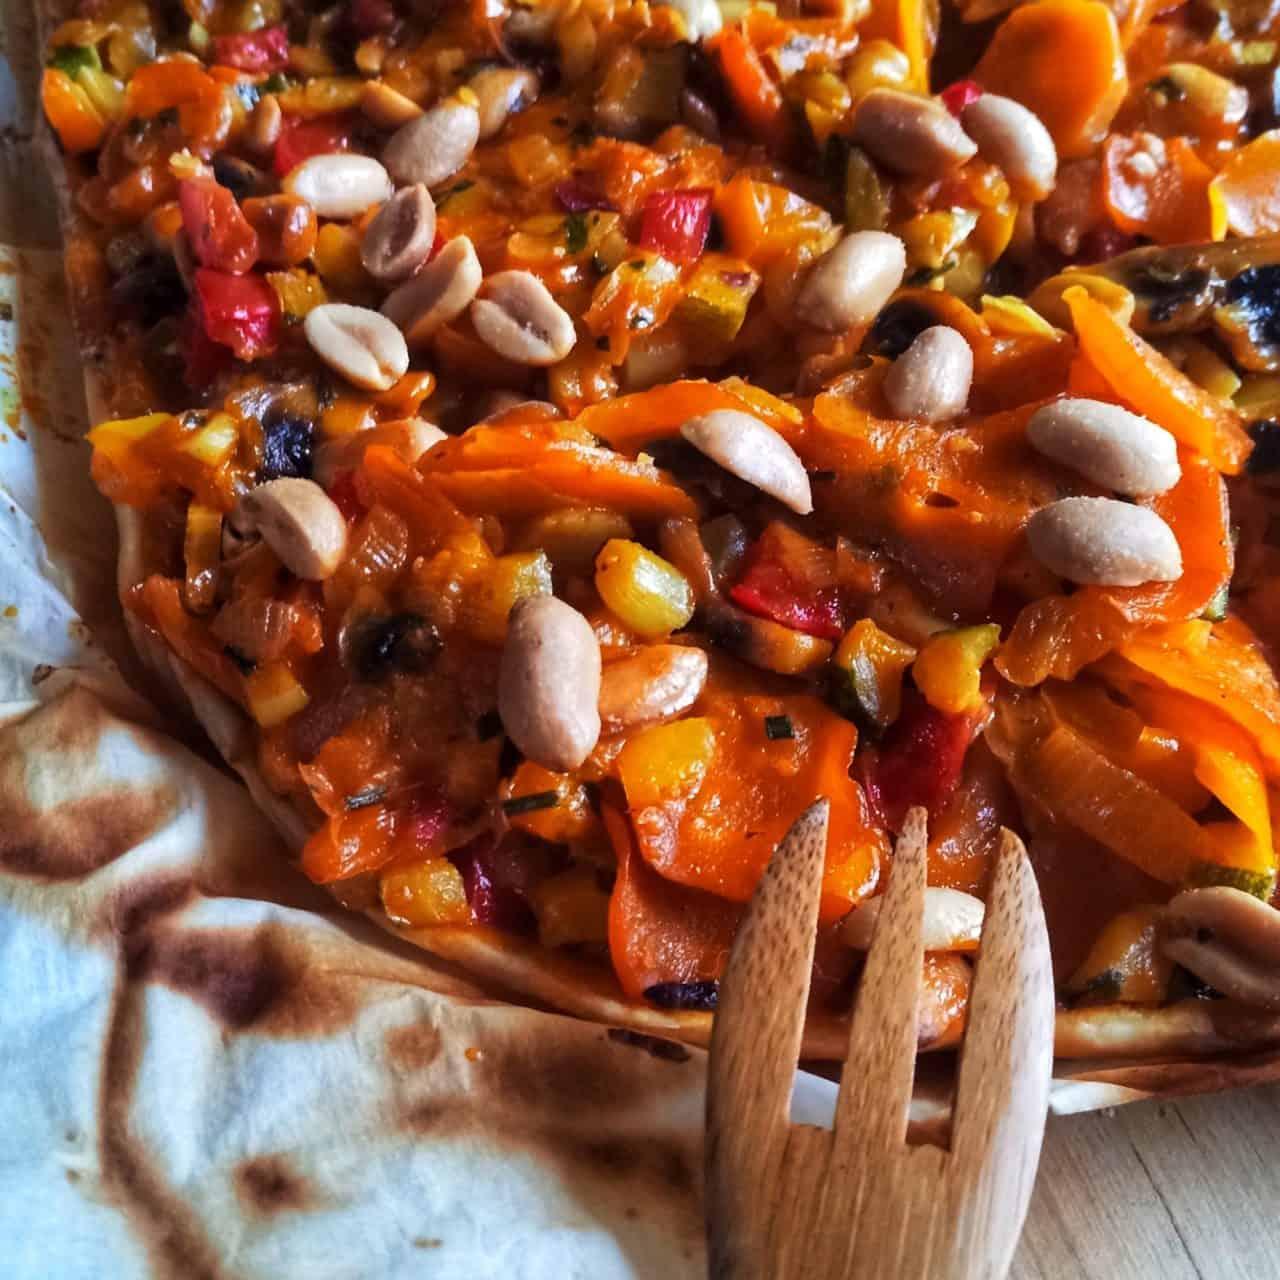 Vegane Campinggerichte - Karotten-Lauch-Tarte